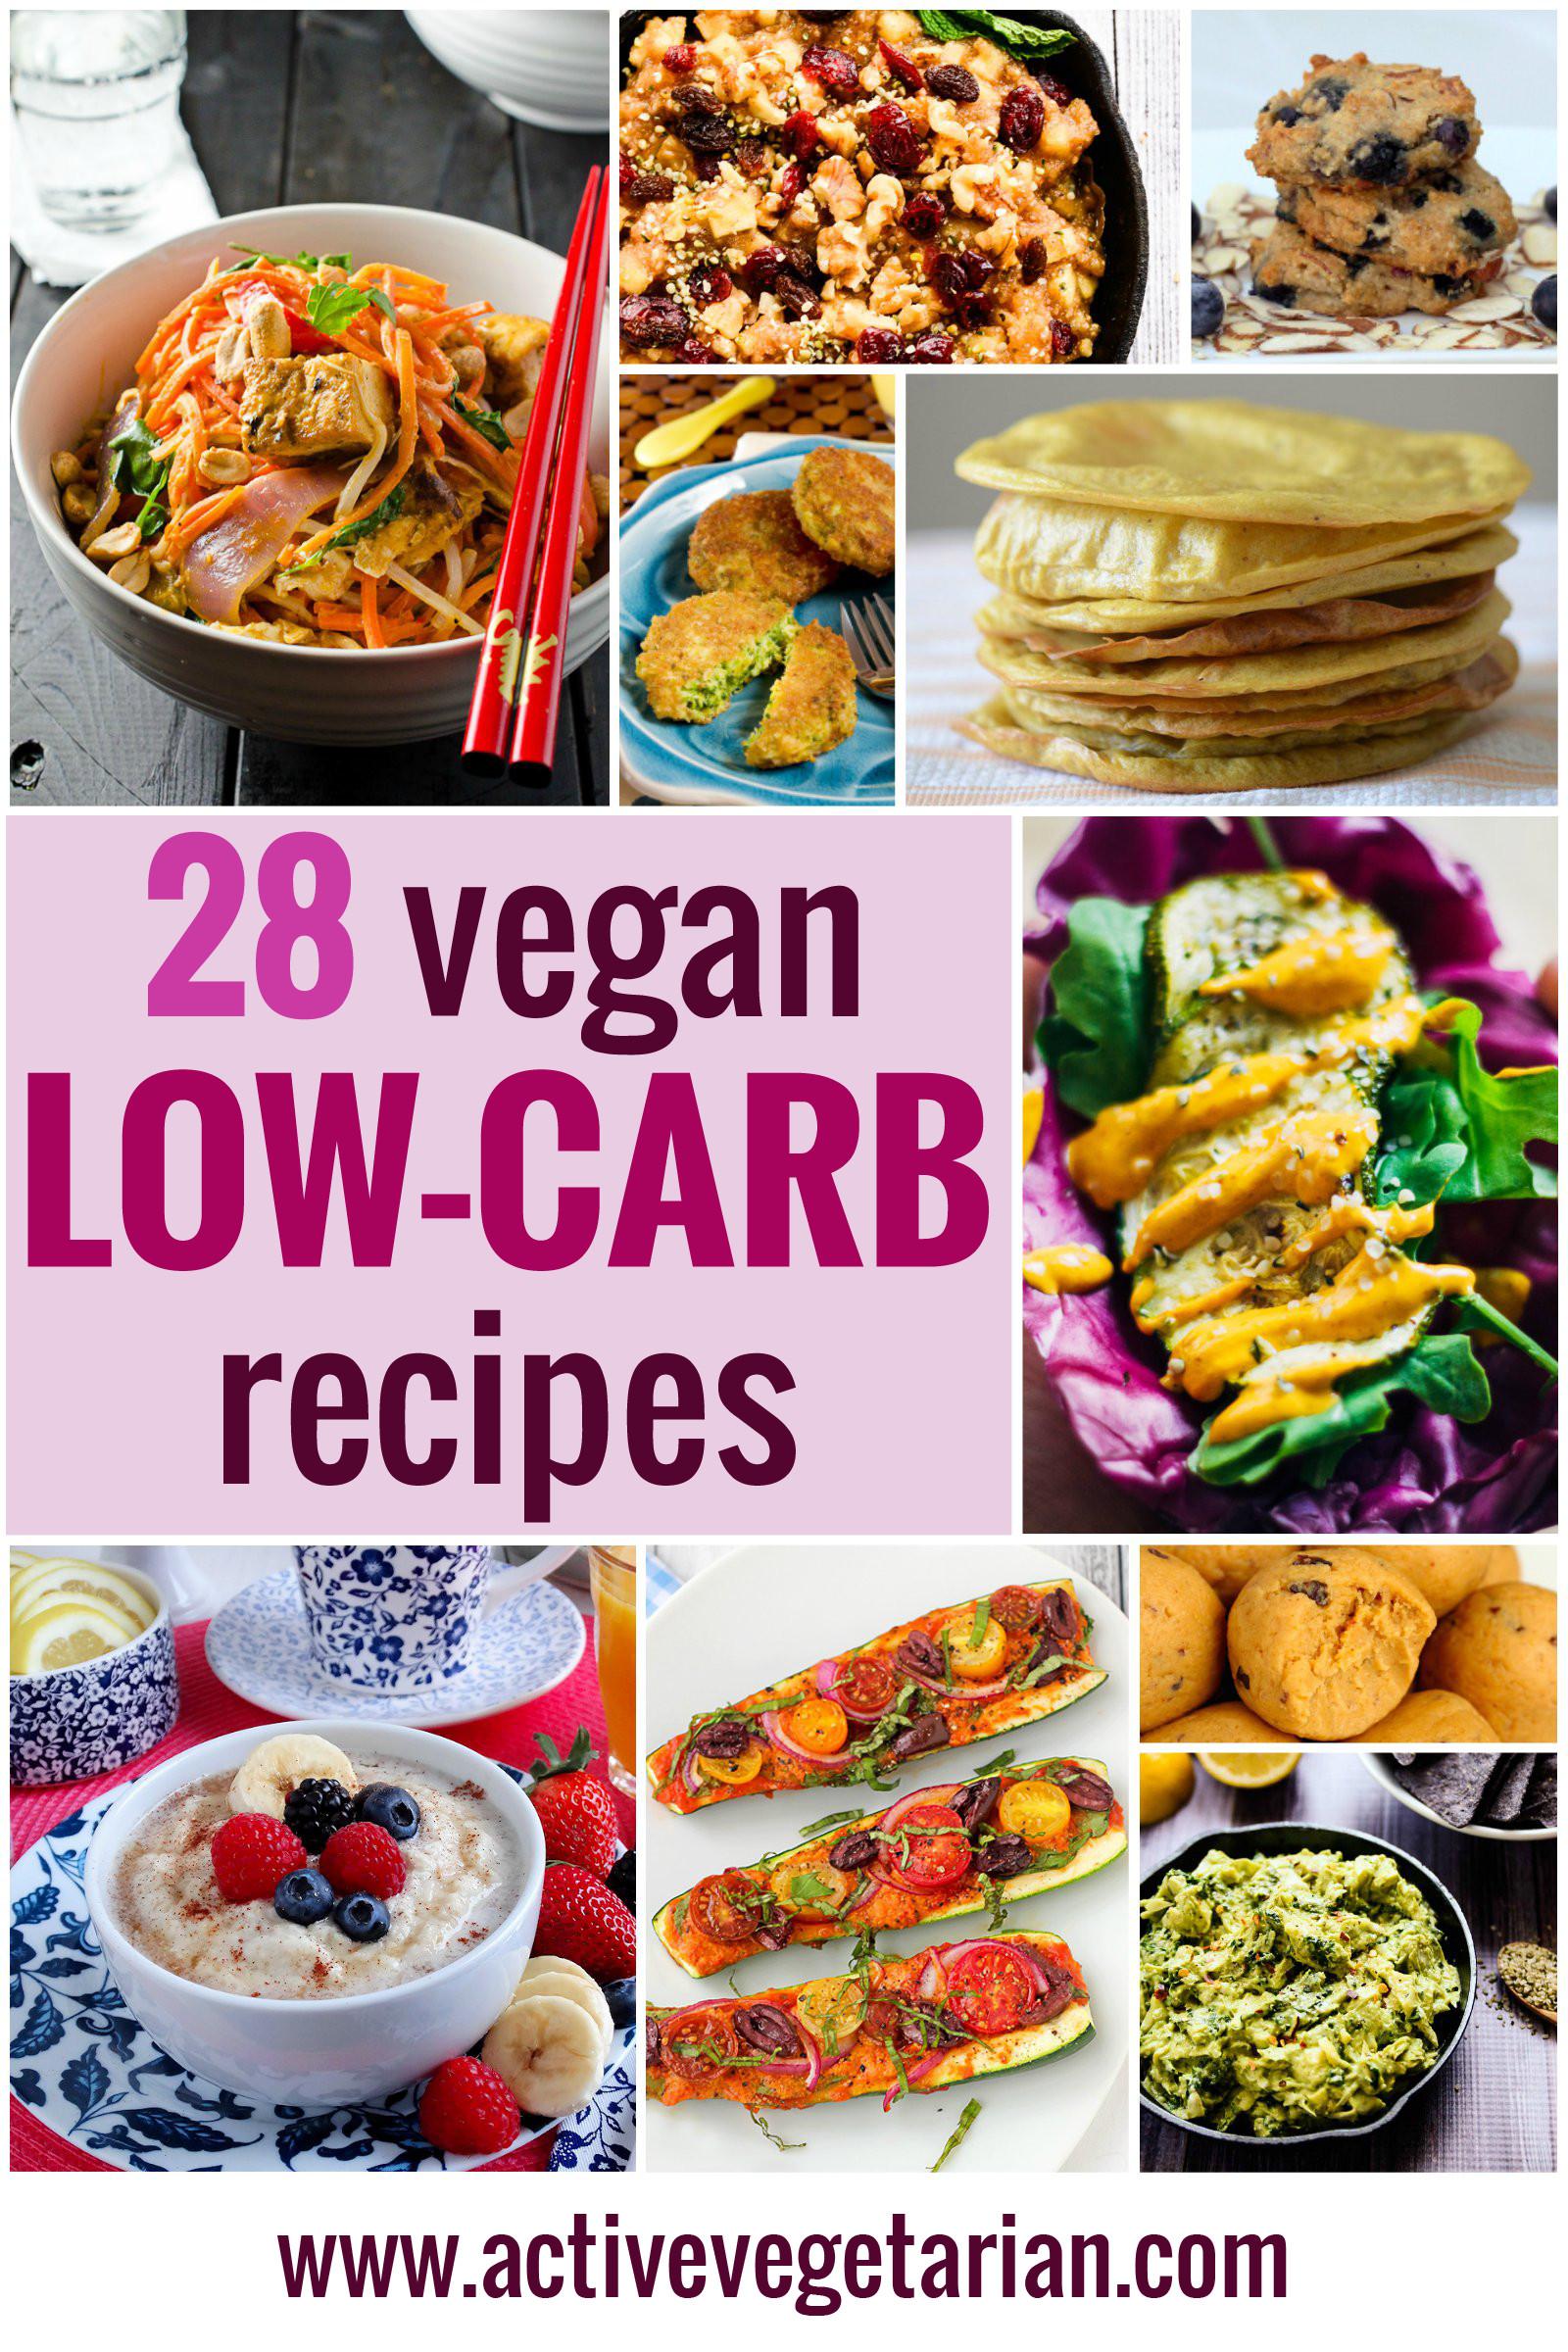 Low Carb Vegan Dinner  Recipe Round Up – 28 Low Carb Vegan Recipes